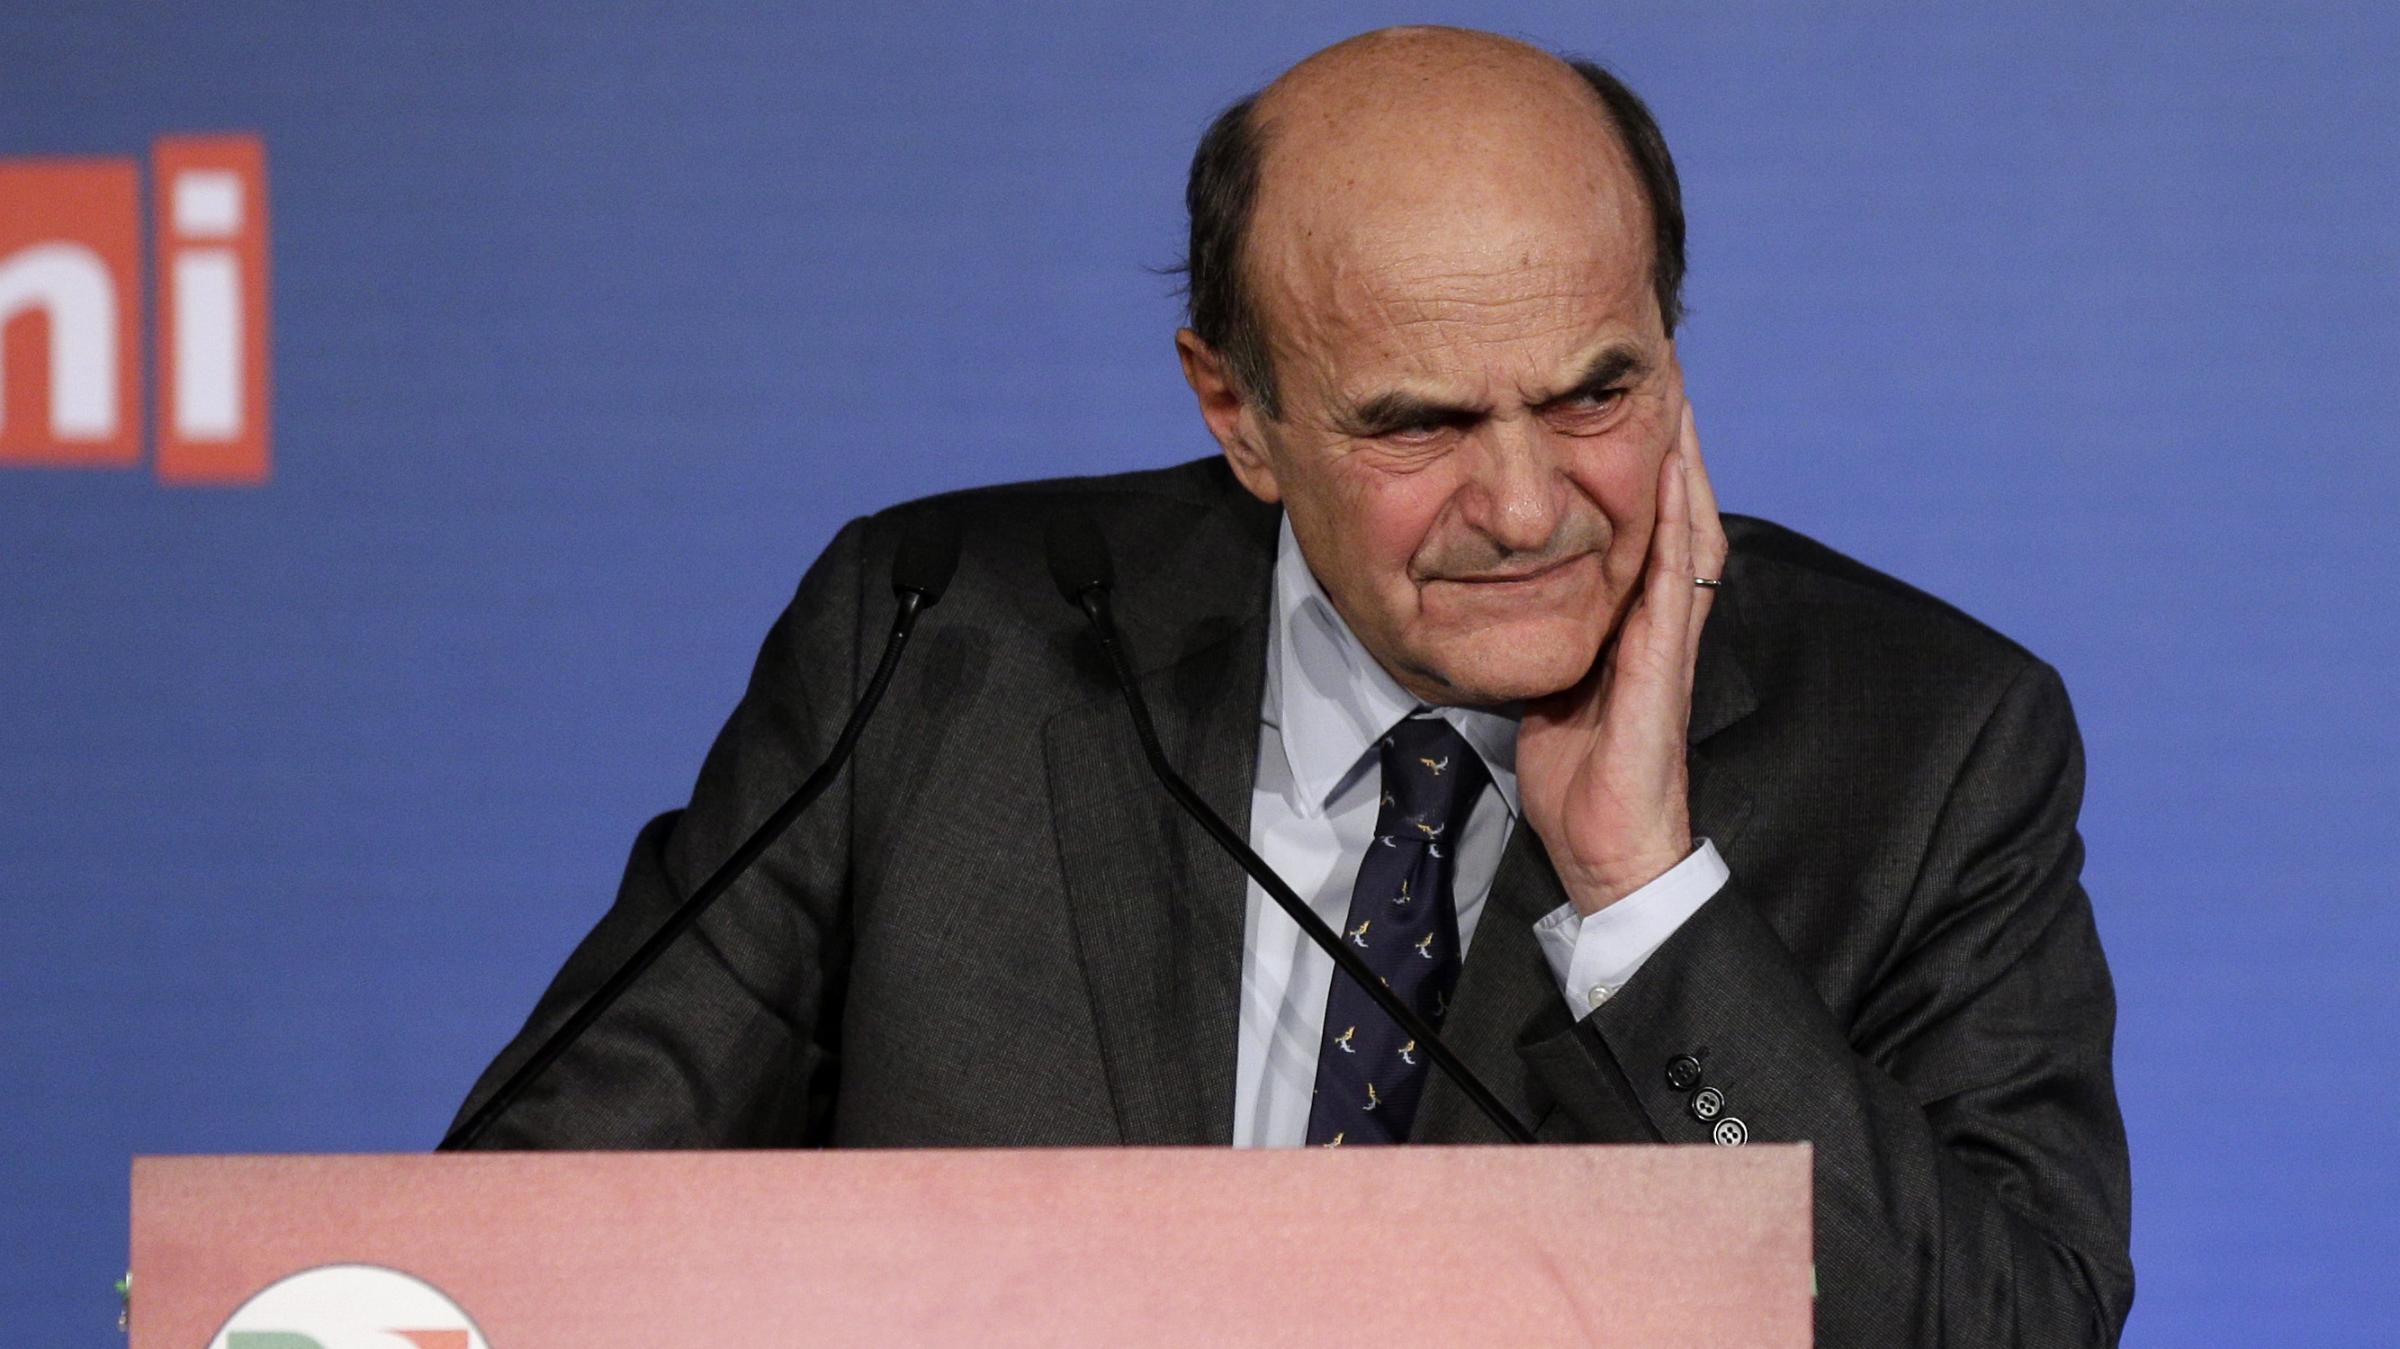 pier luigi bersani italy elections fitch downgrade